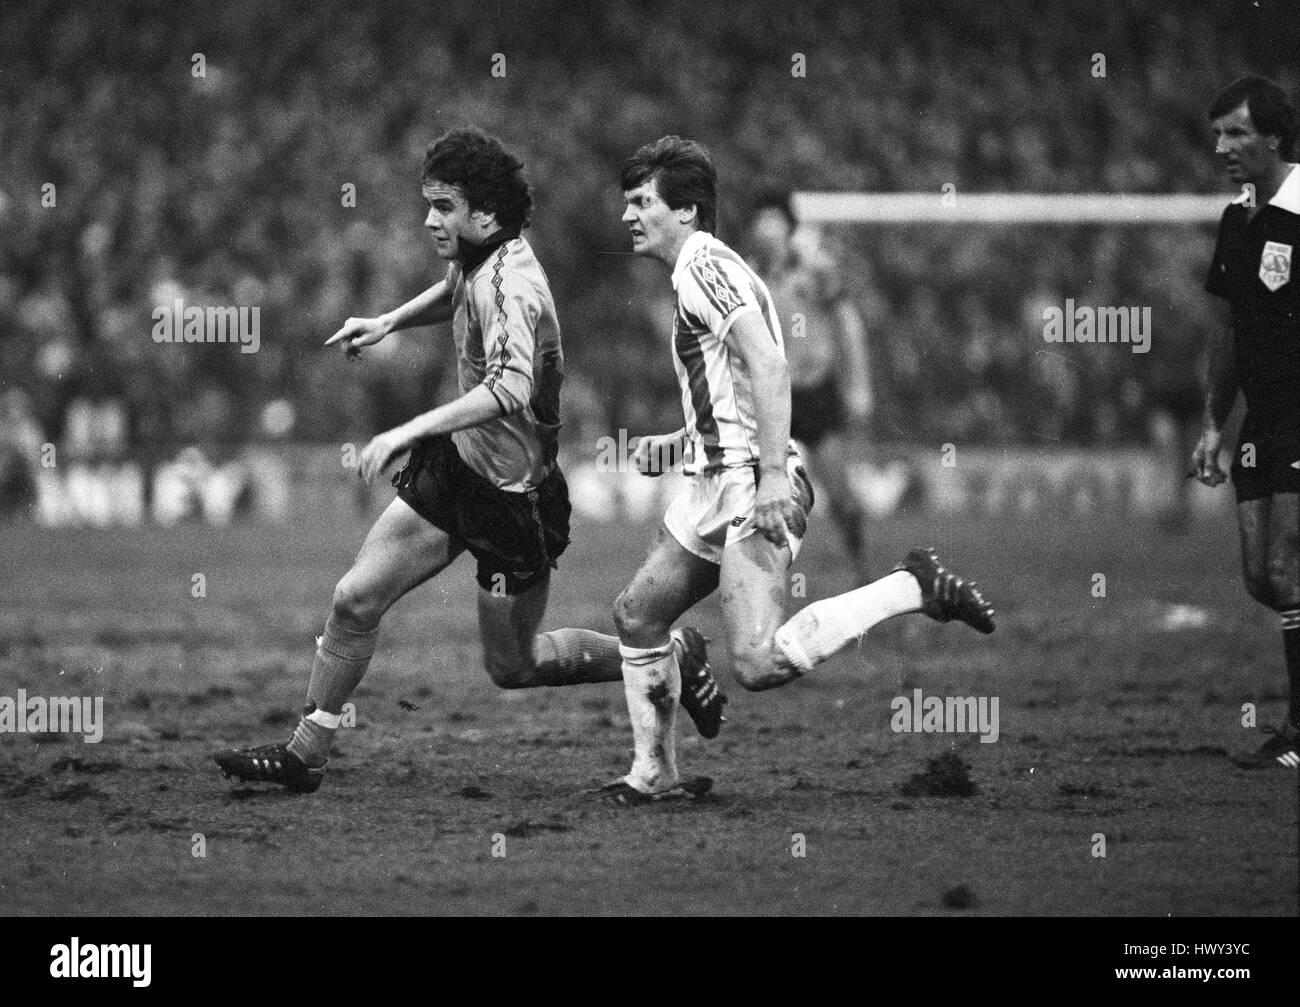 Footballers Hugh Atkinson and Paul Bracewell in action Stoke City v Wolverhampton Wanderers 03 January 1981 - Stock Image